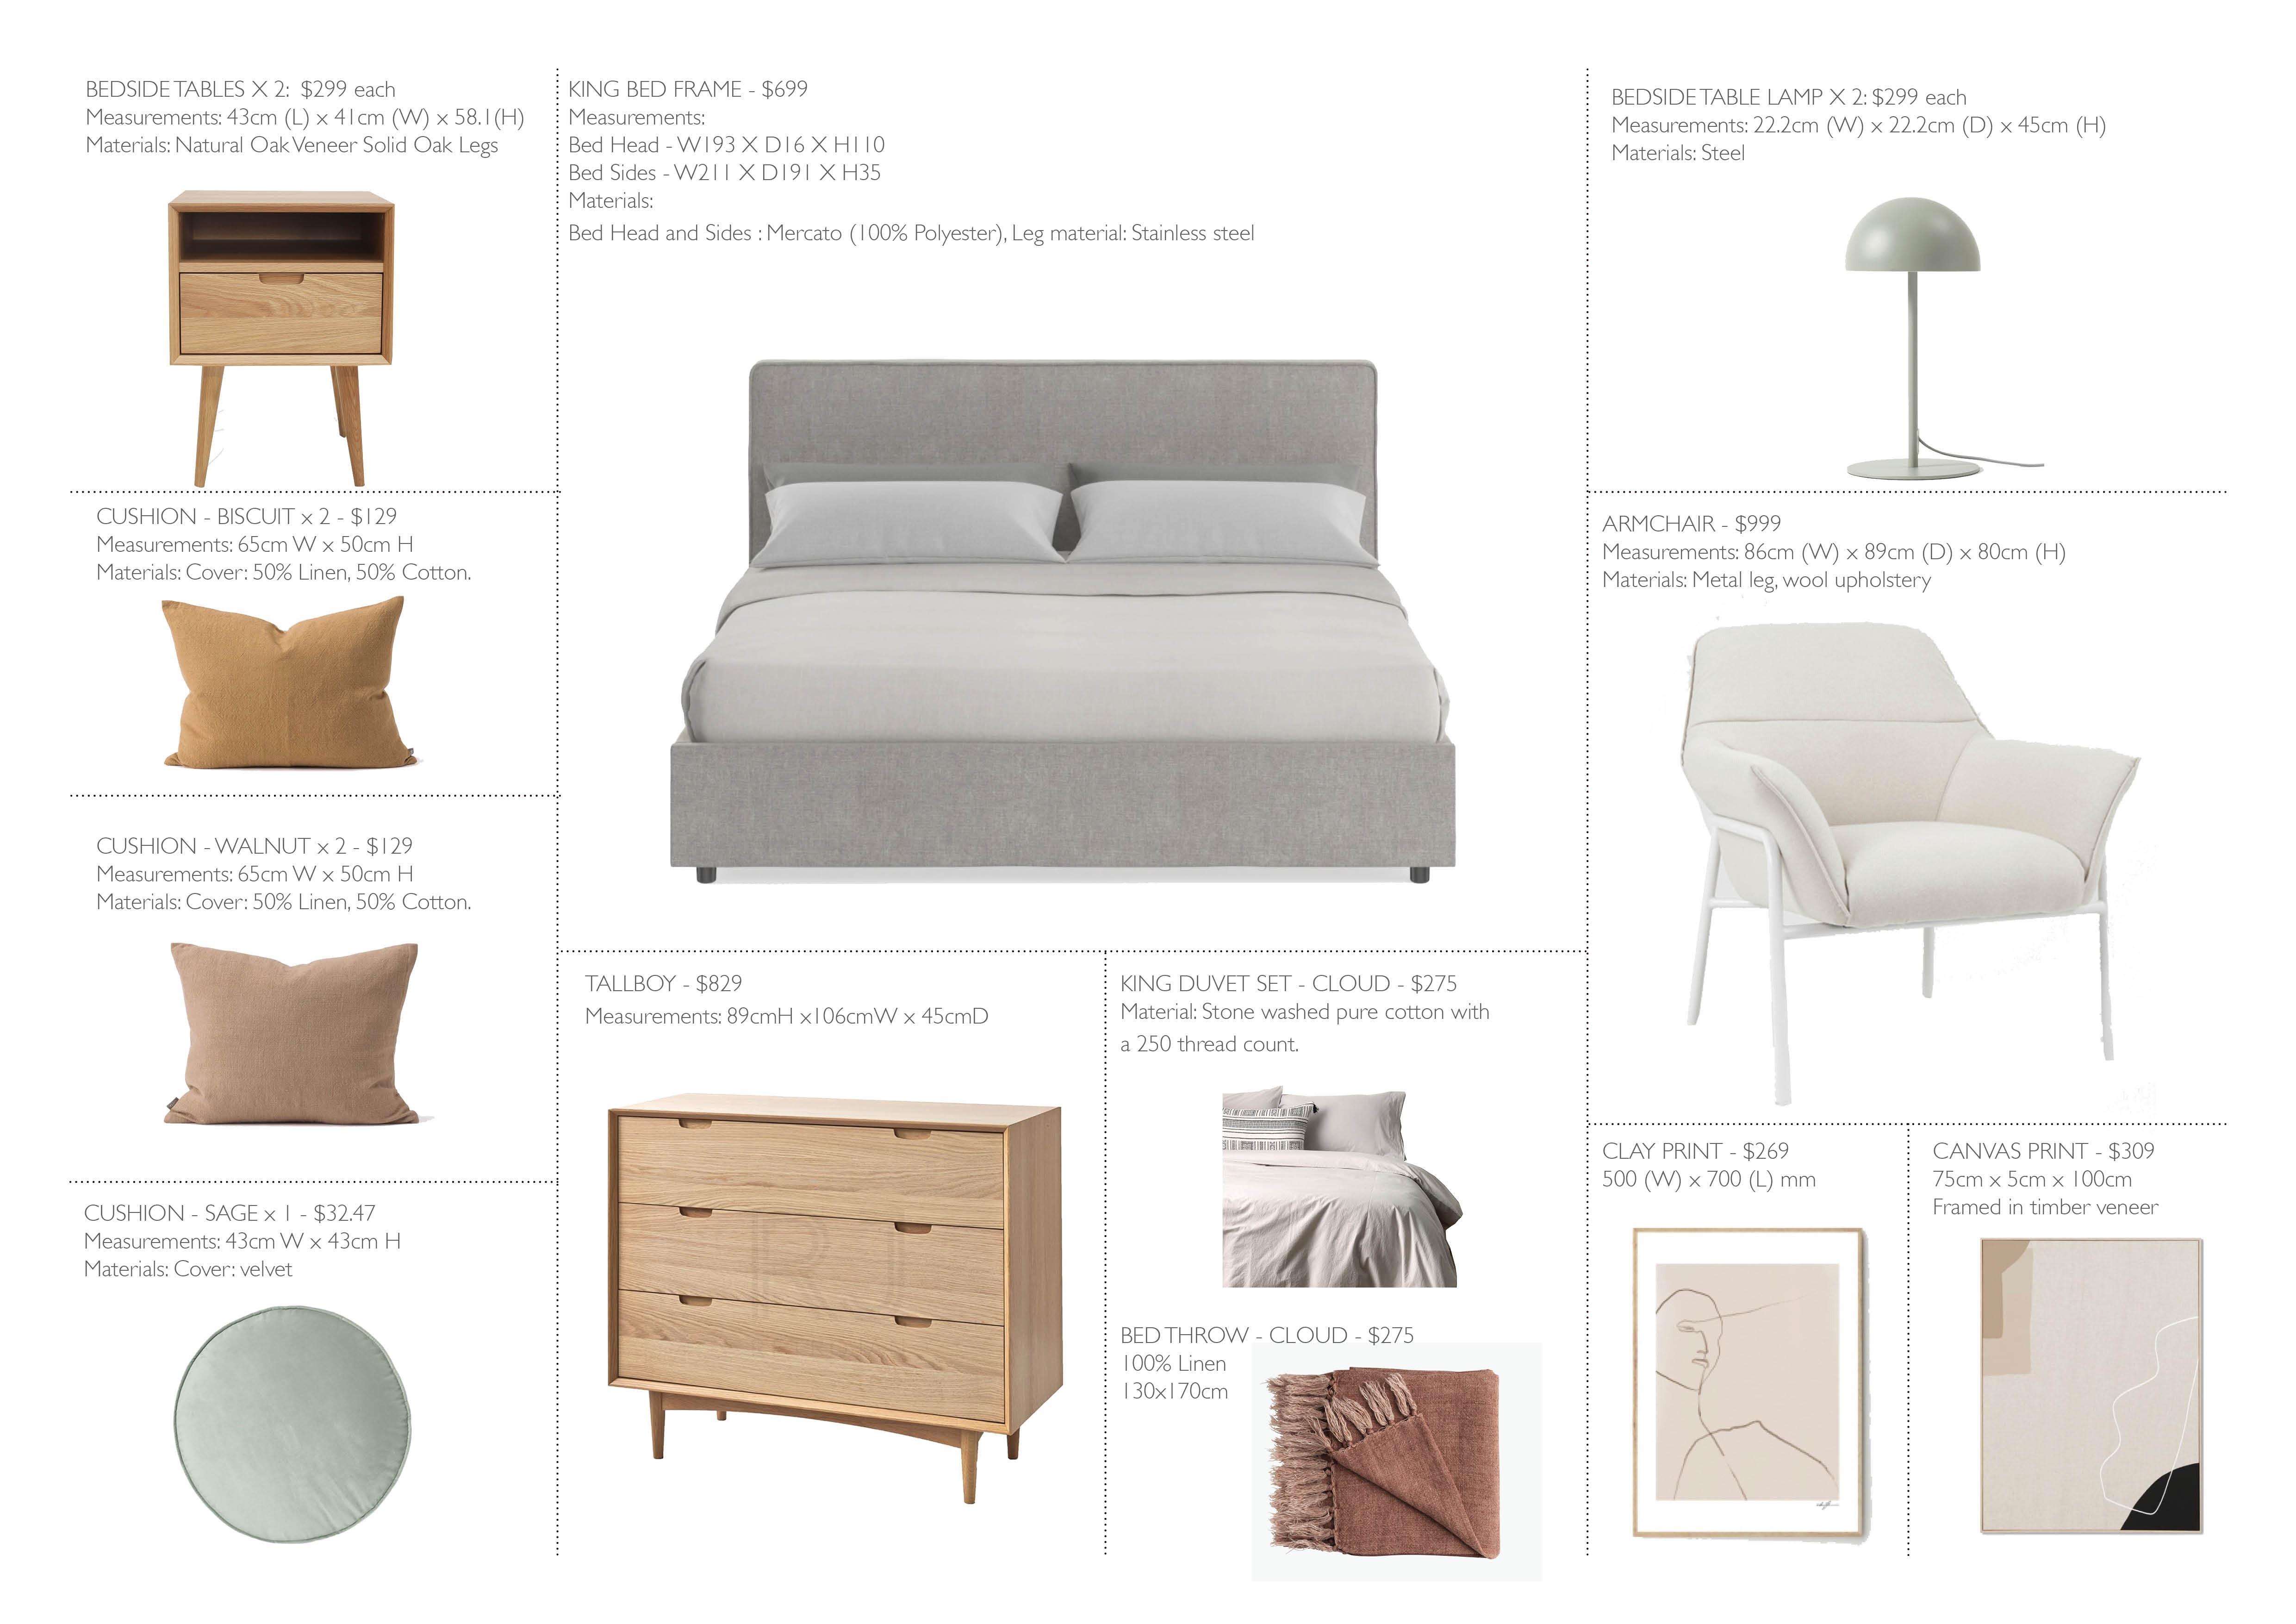 Final Shopping List for Alana's Master Bedroom